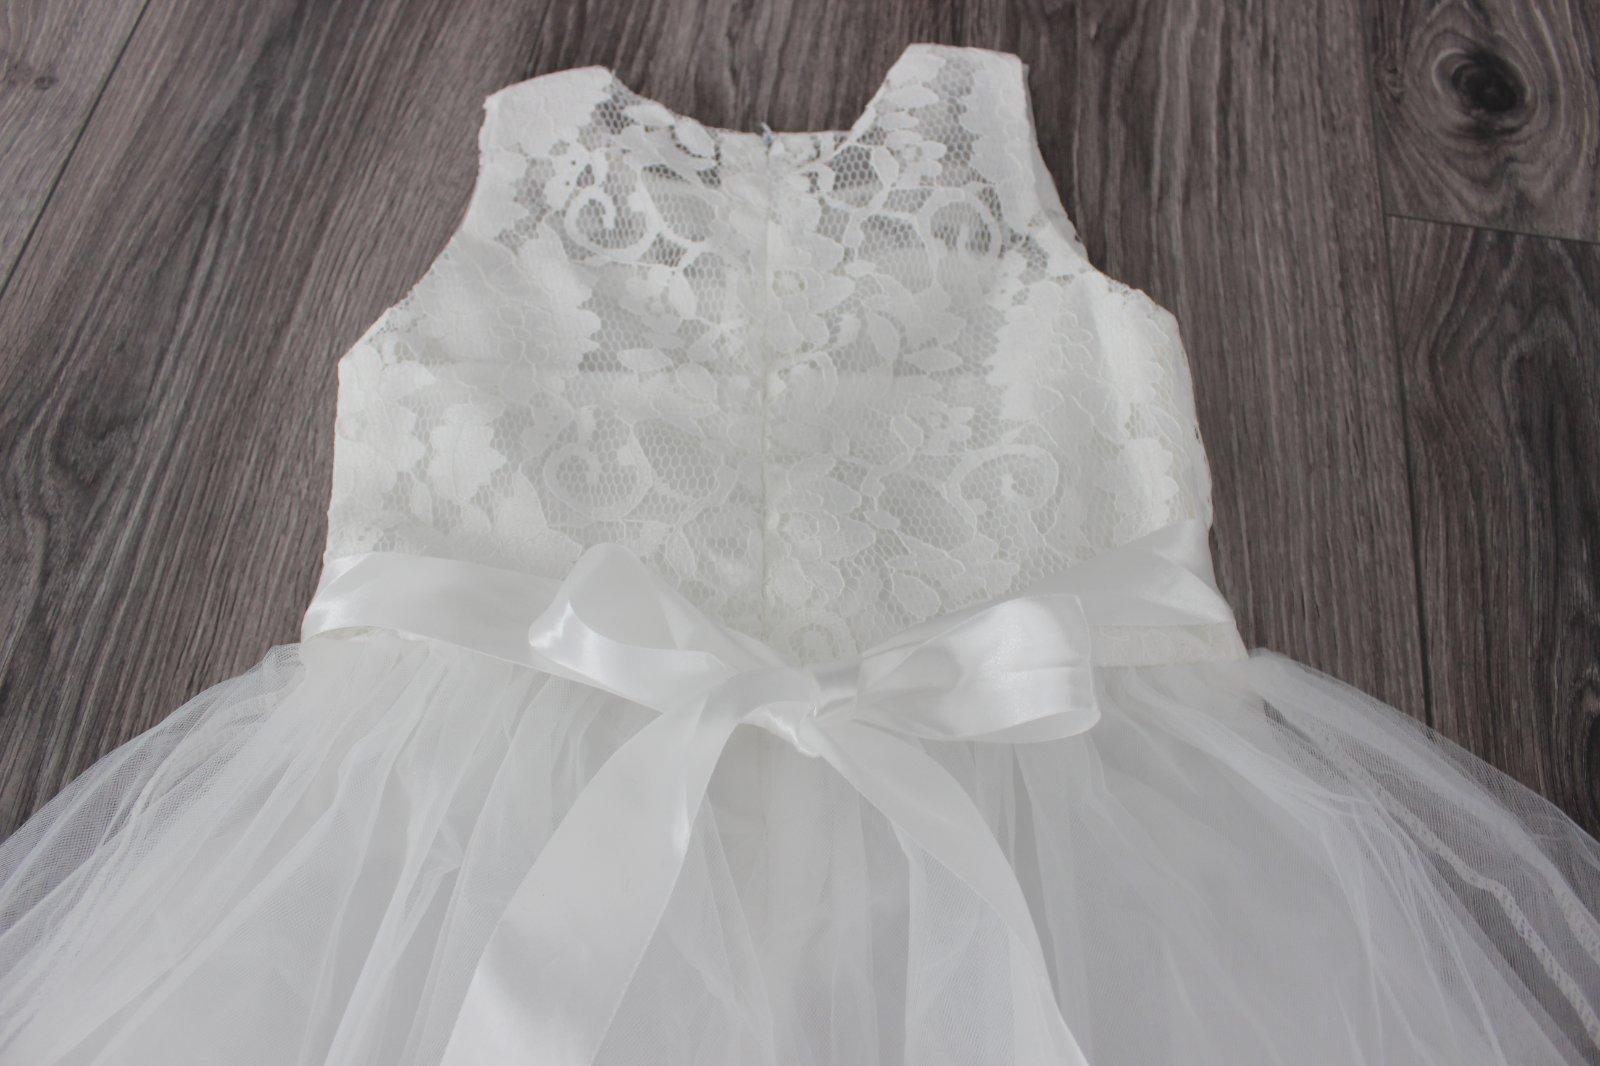 Dievčenské šaty veľ. 122/128 - Obrázok č. 2